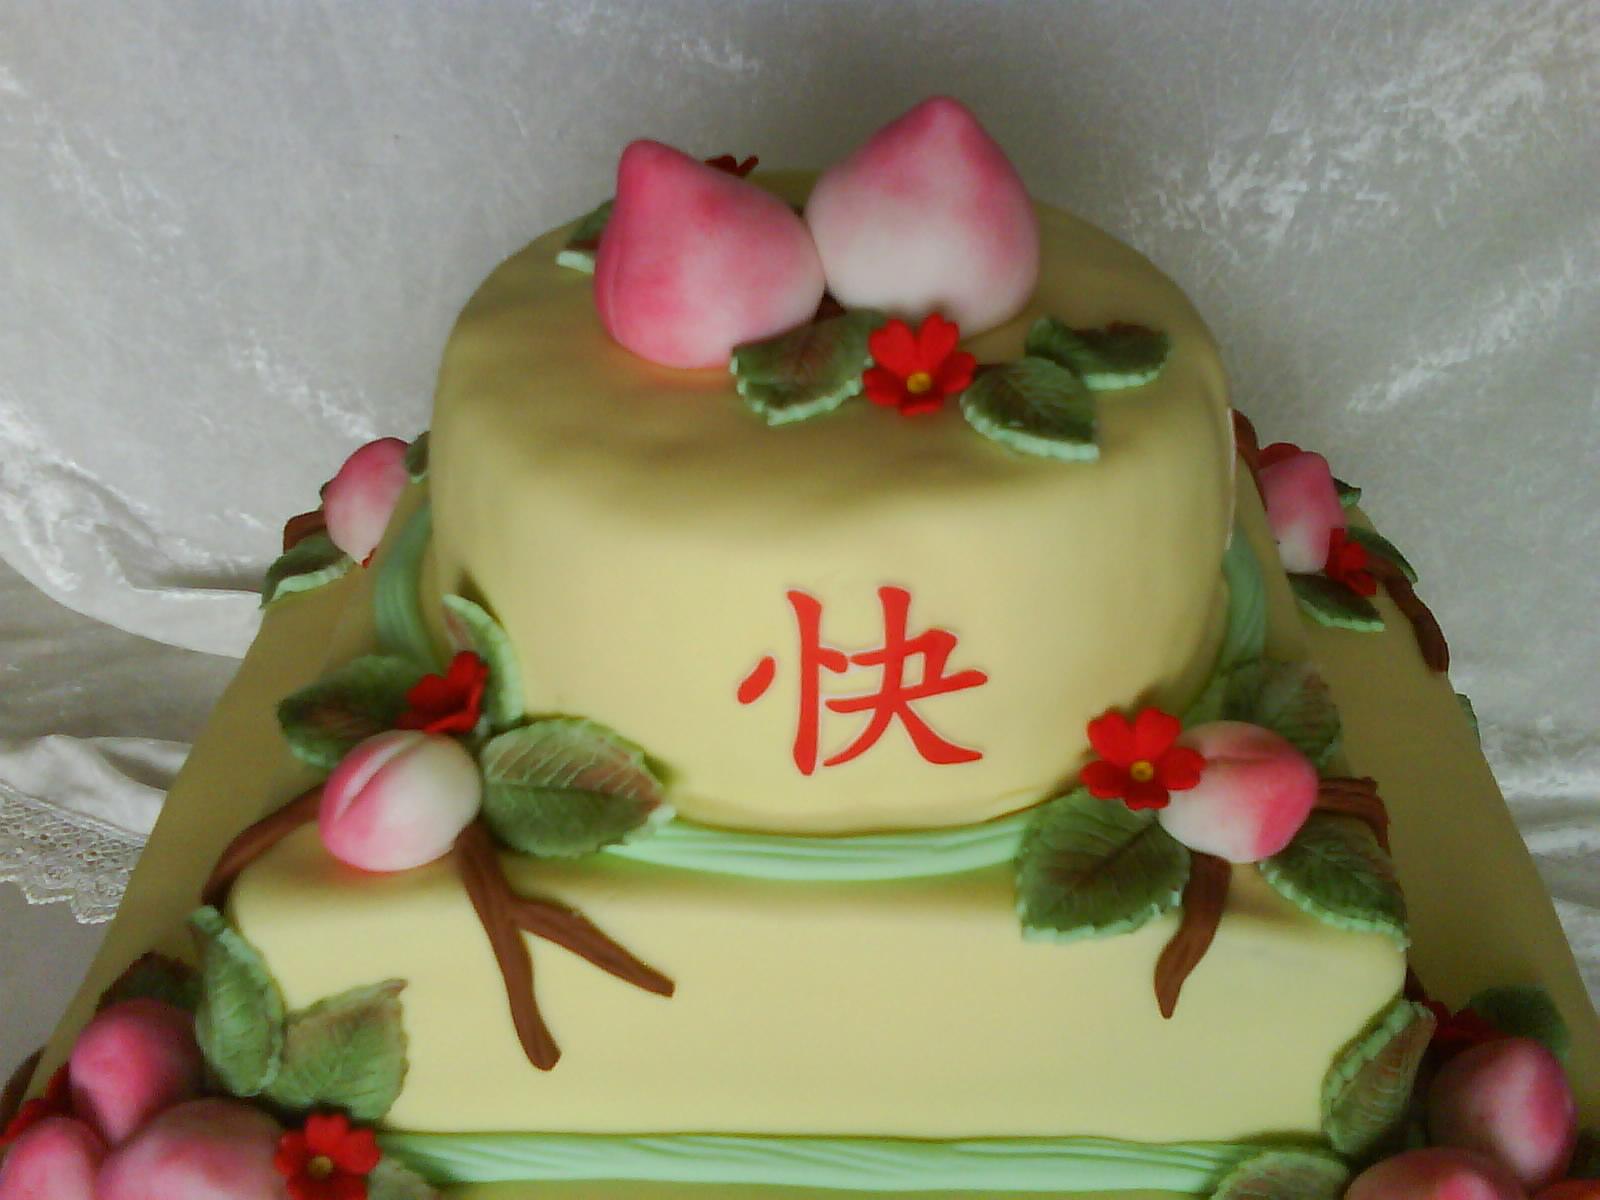 THE BEST CAKES IN TOWN: GRANDPA BIRTHDAY CAKE